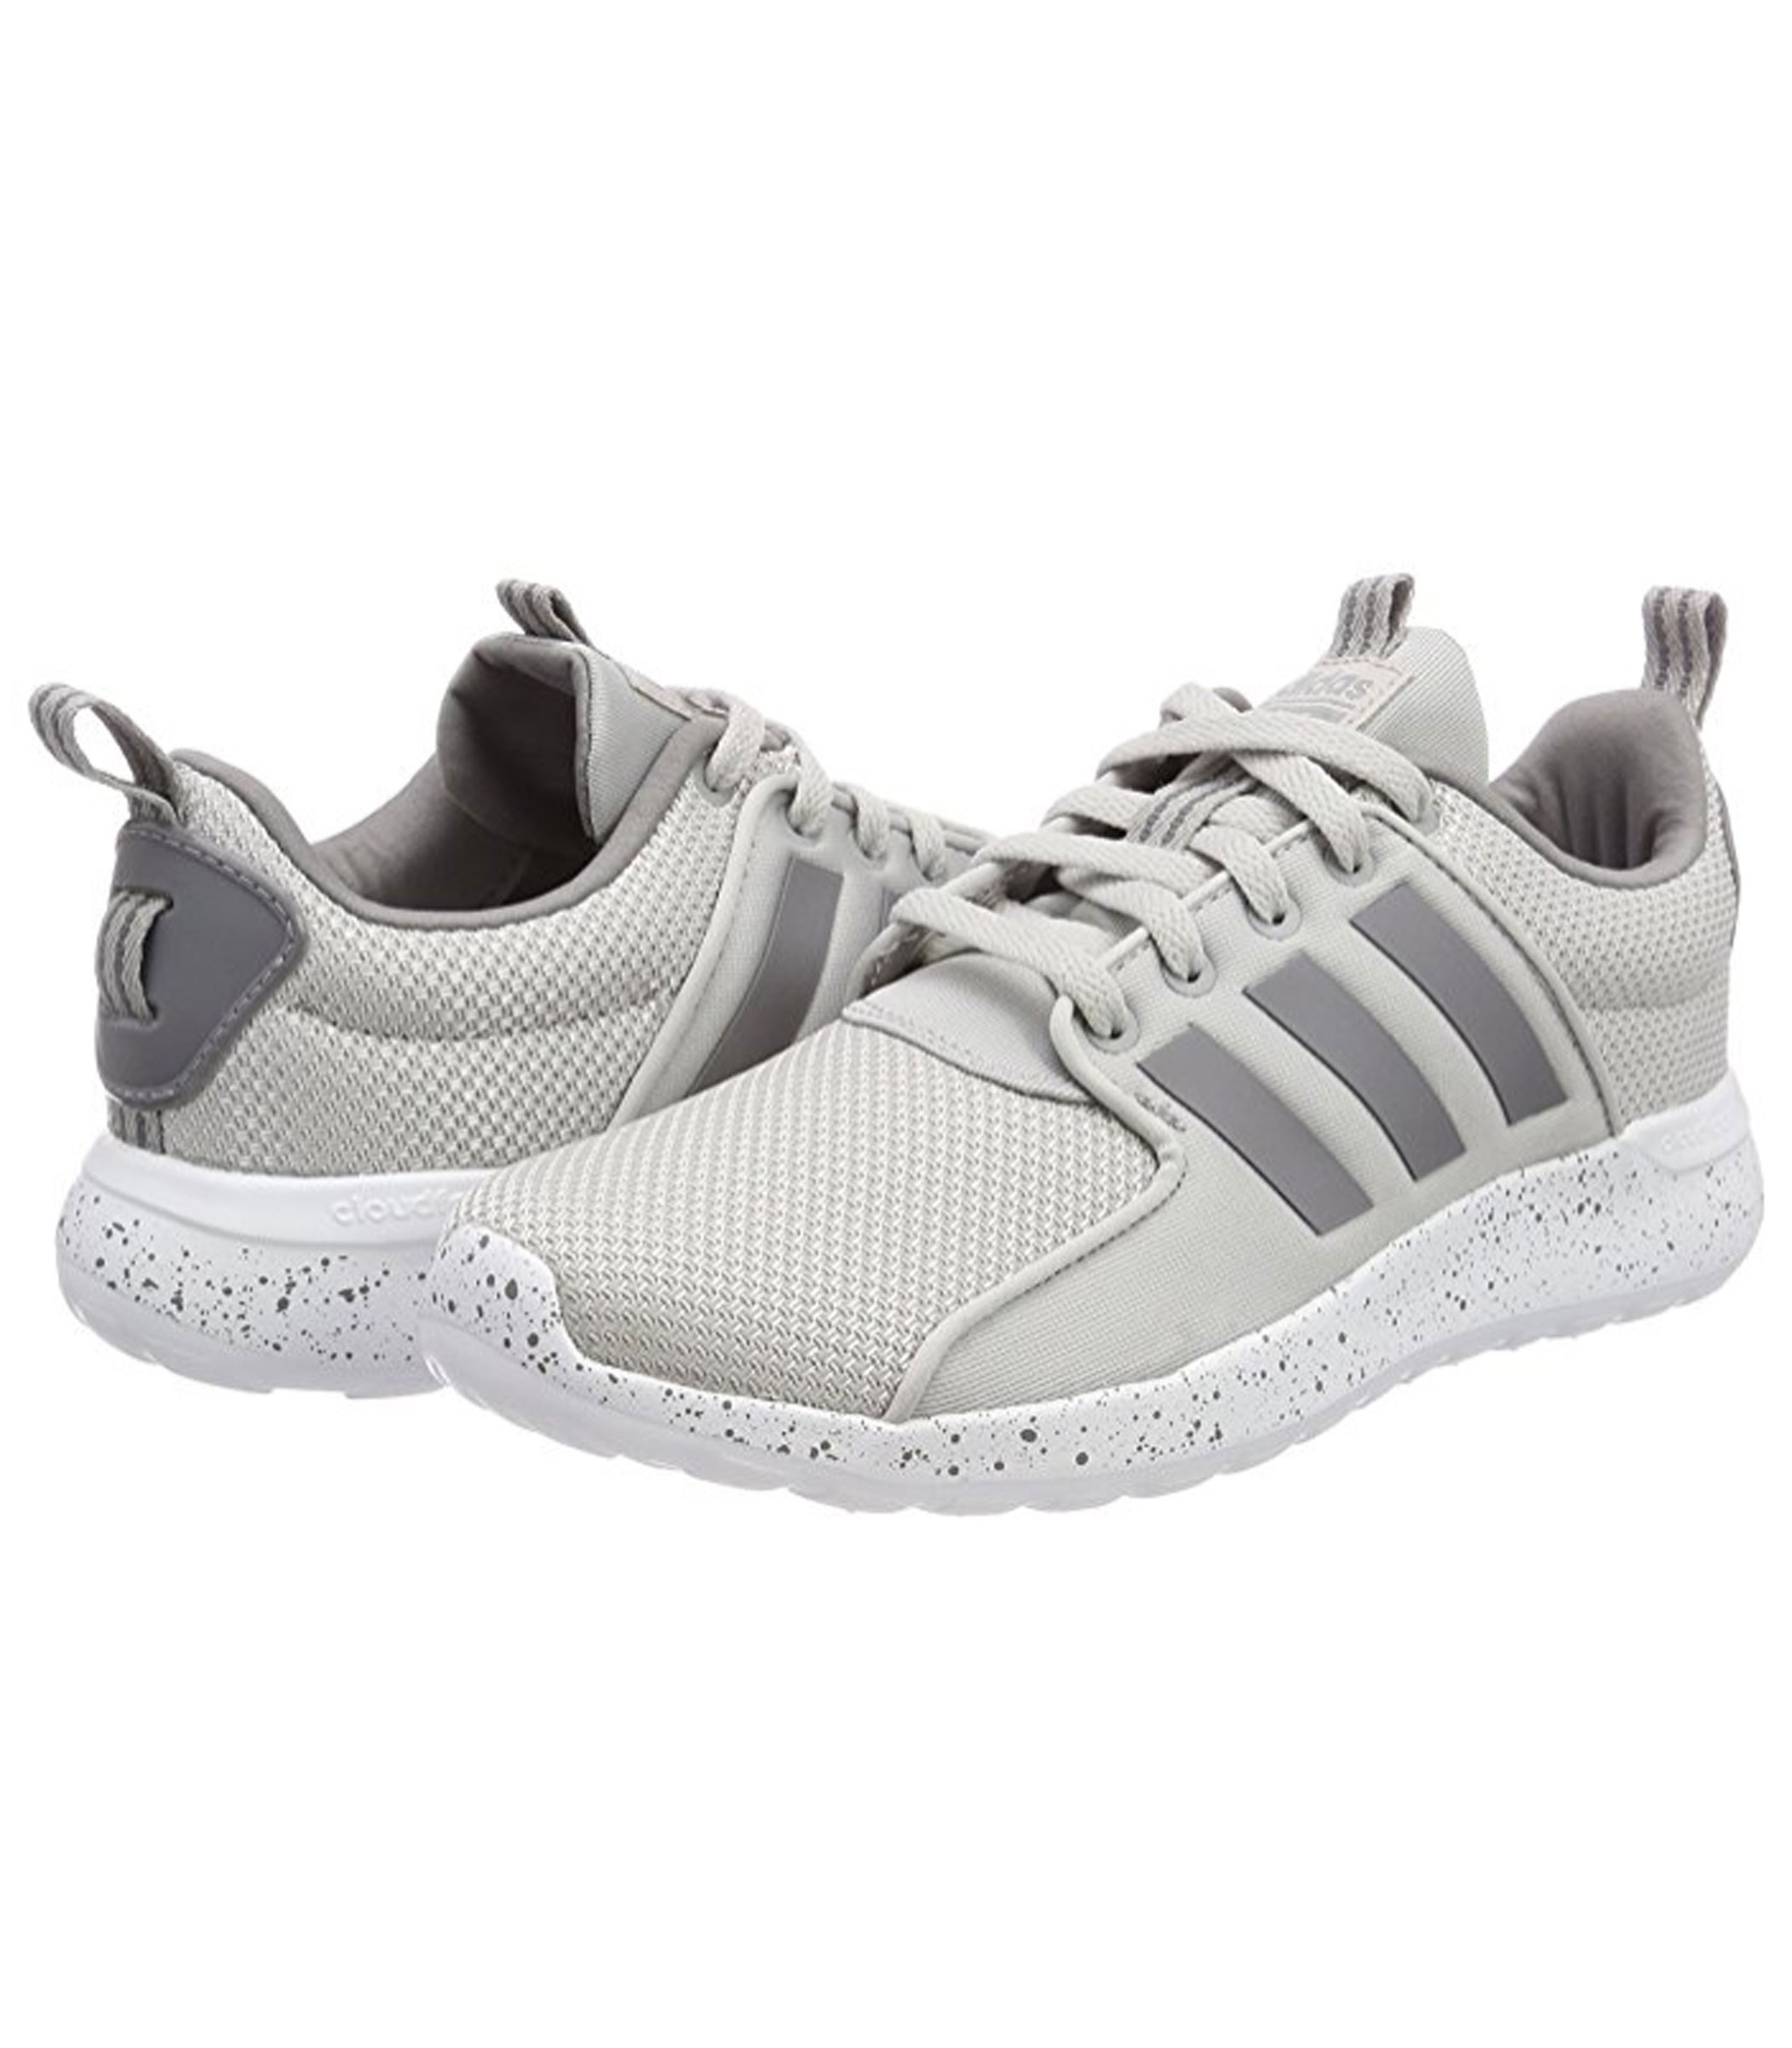 official photos 3c525 4f23a Scarpe Sneakers Running Adidas CF Cloudfoam Lite Racer rif. DA9840 -  zukunftsfee.info